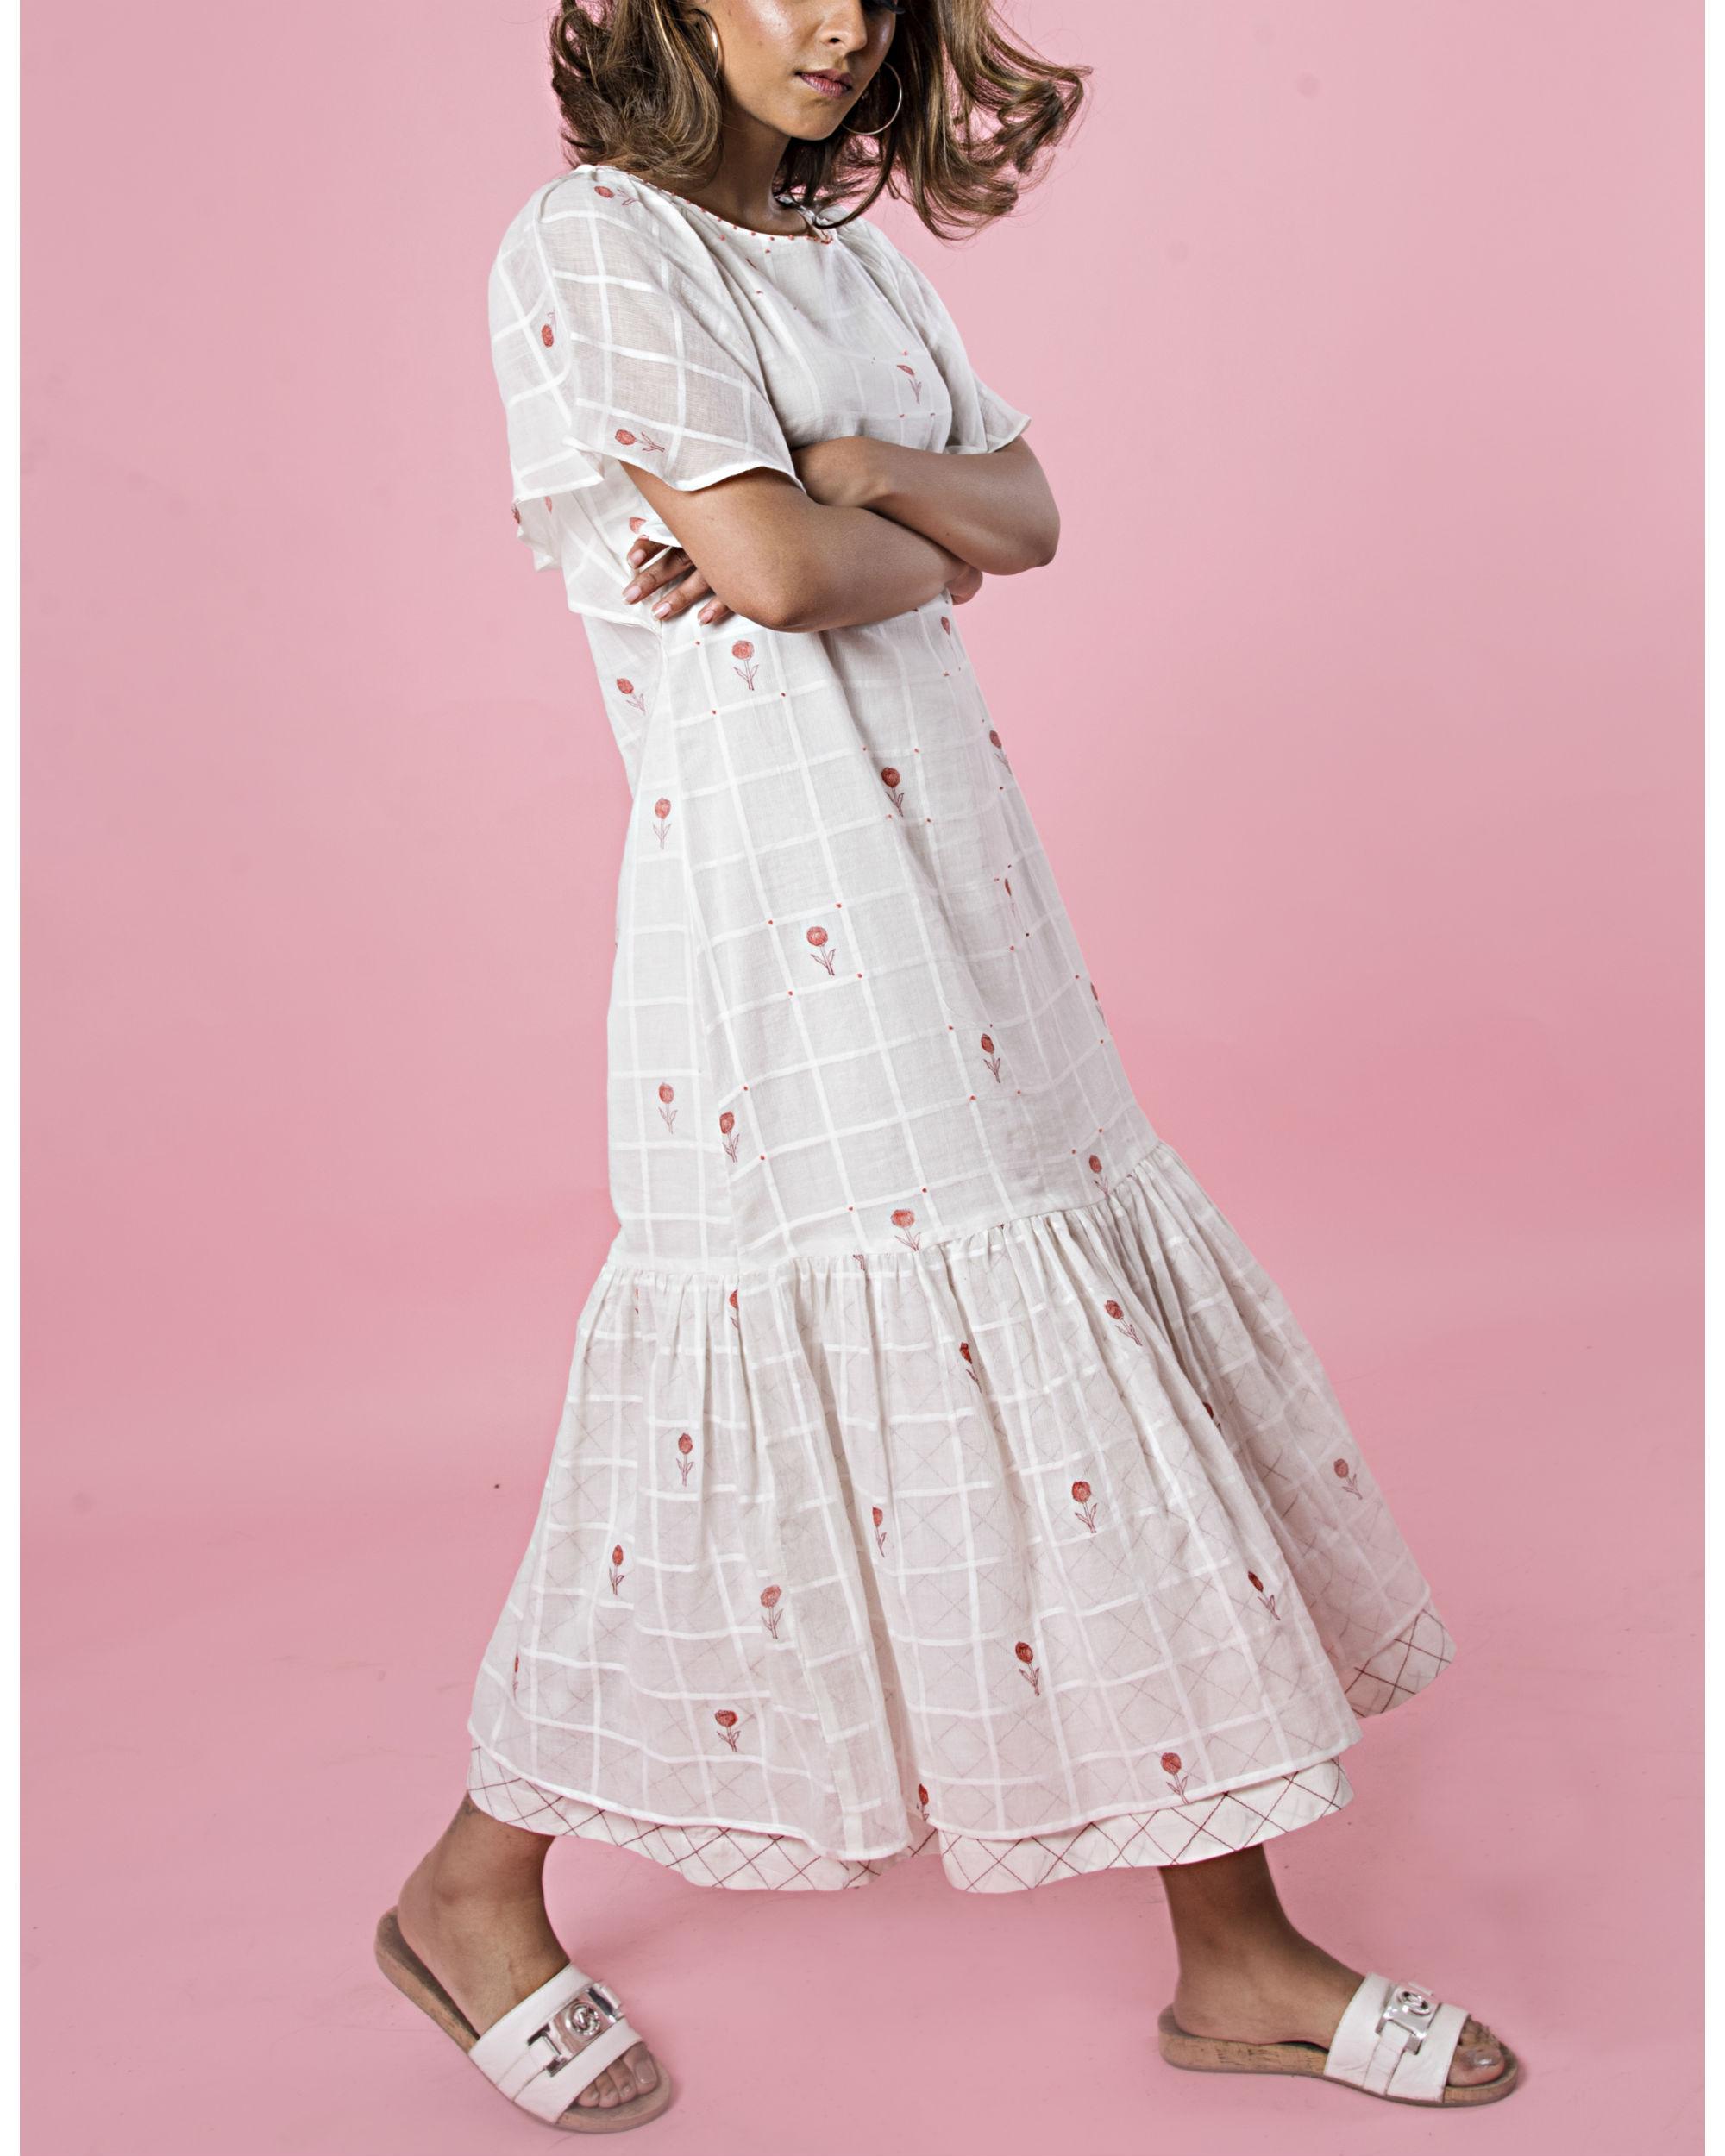 White peach trumpet dress